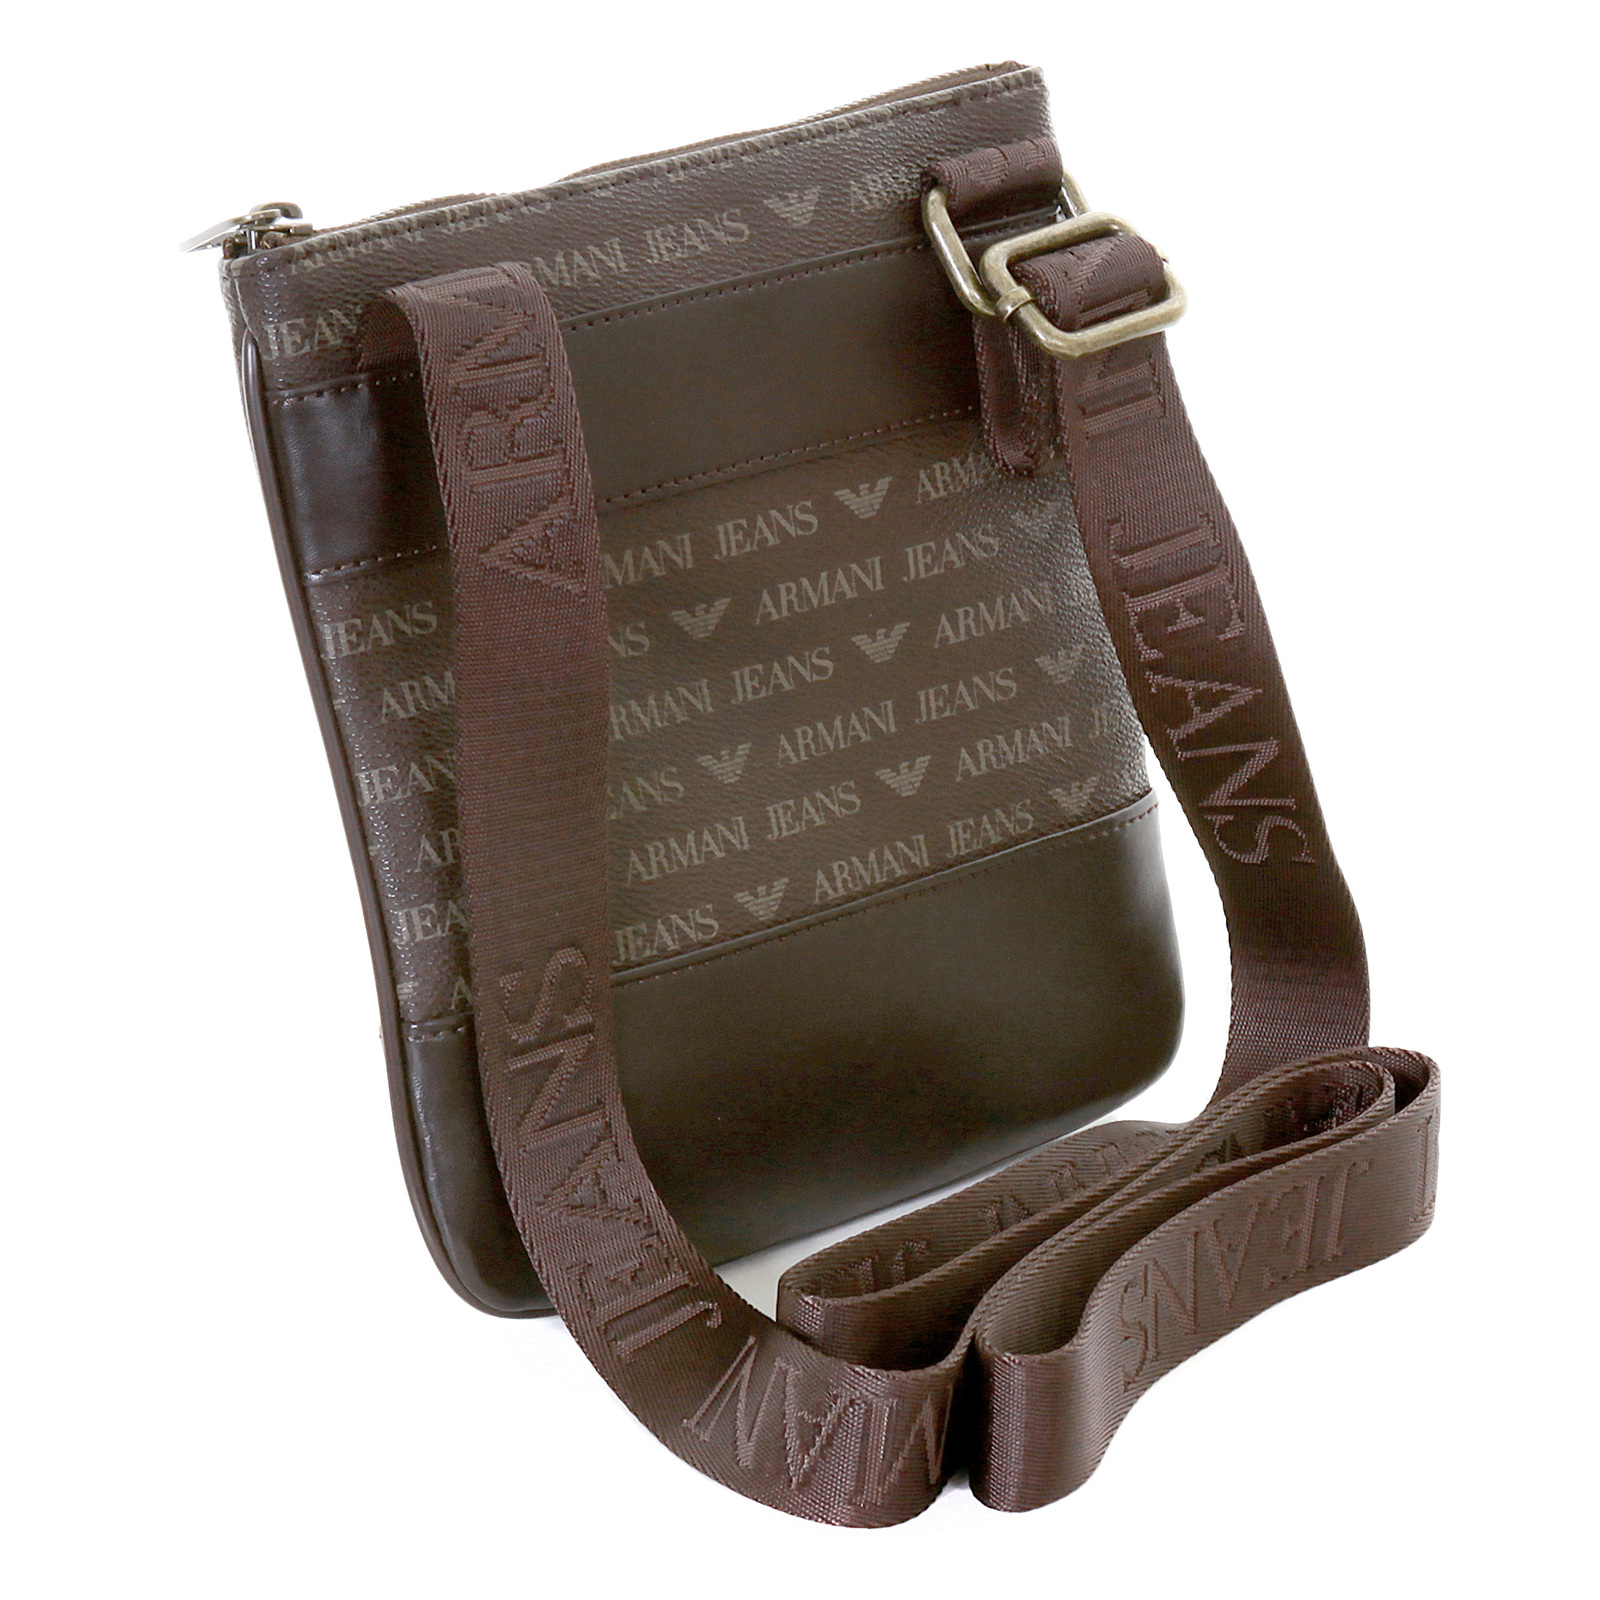 Armani Jeans mens brown logo small messenger bag AJM2472 at Togged ... de49d126283b9